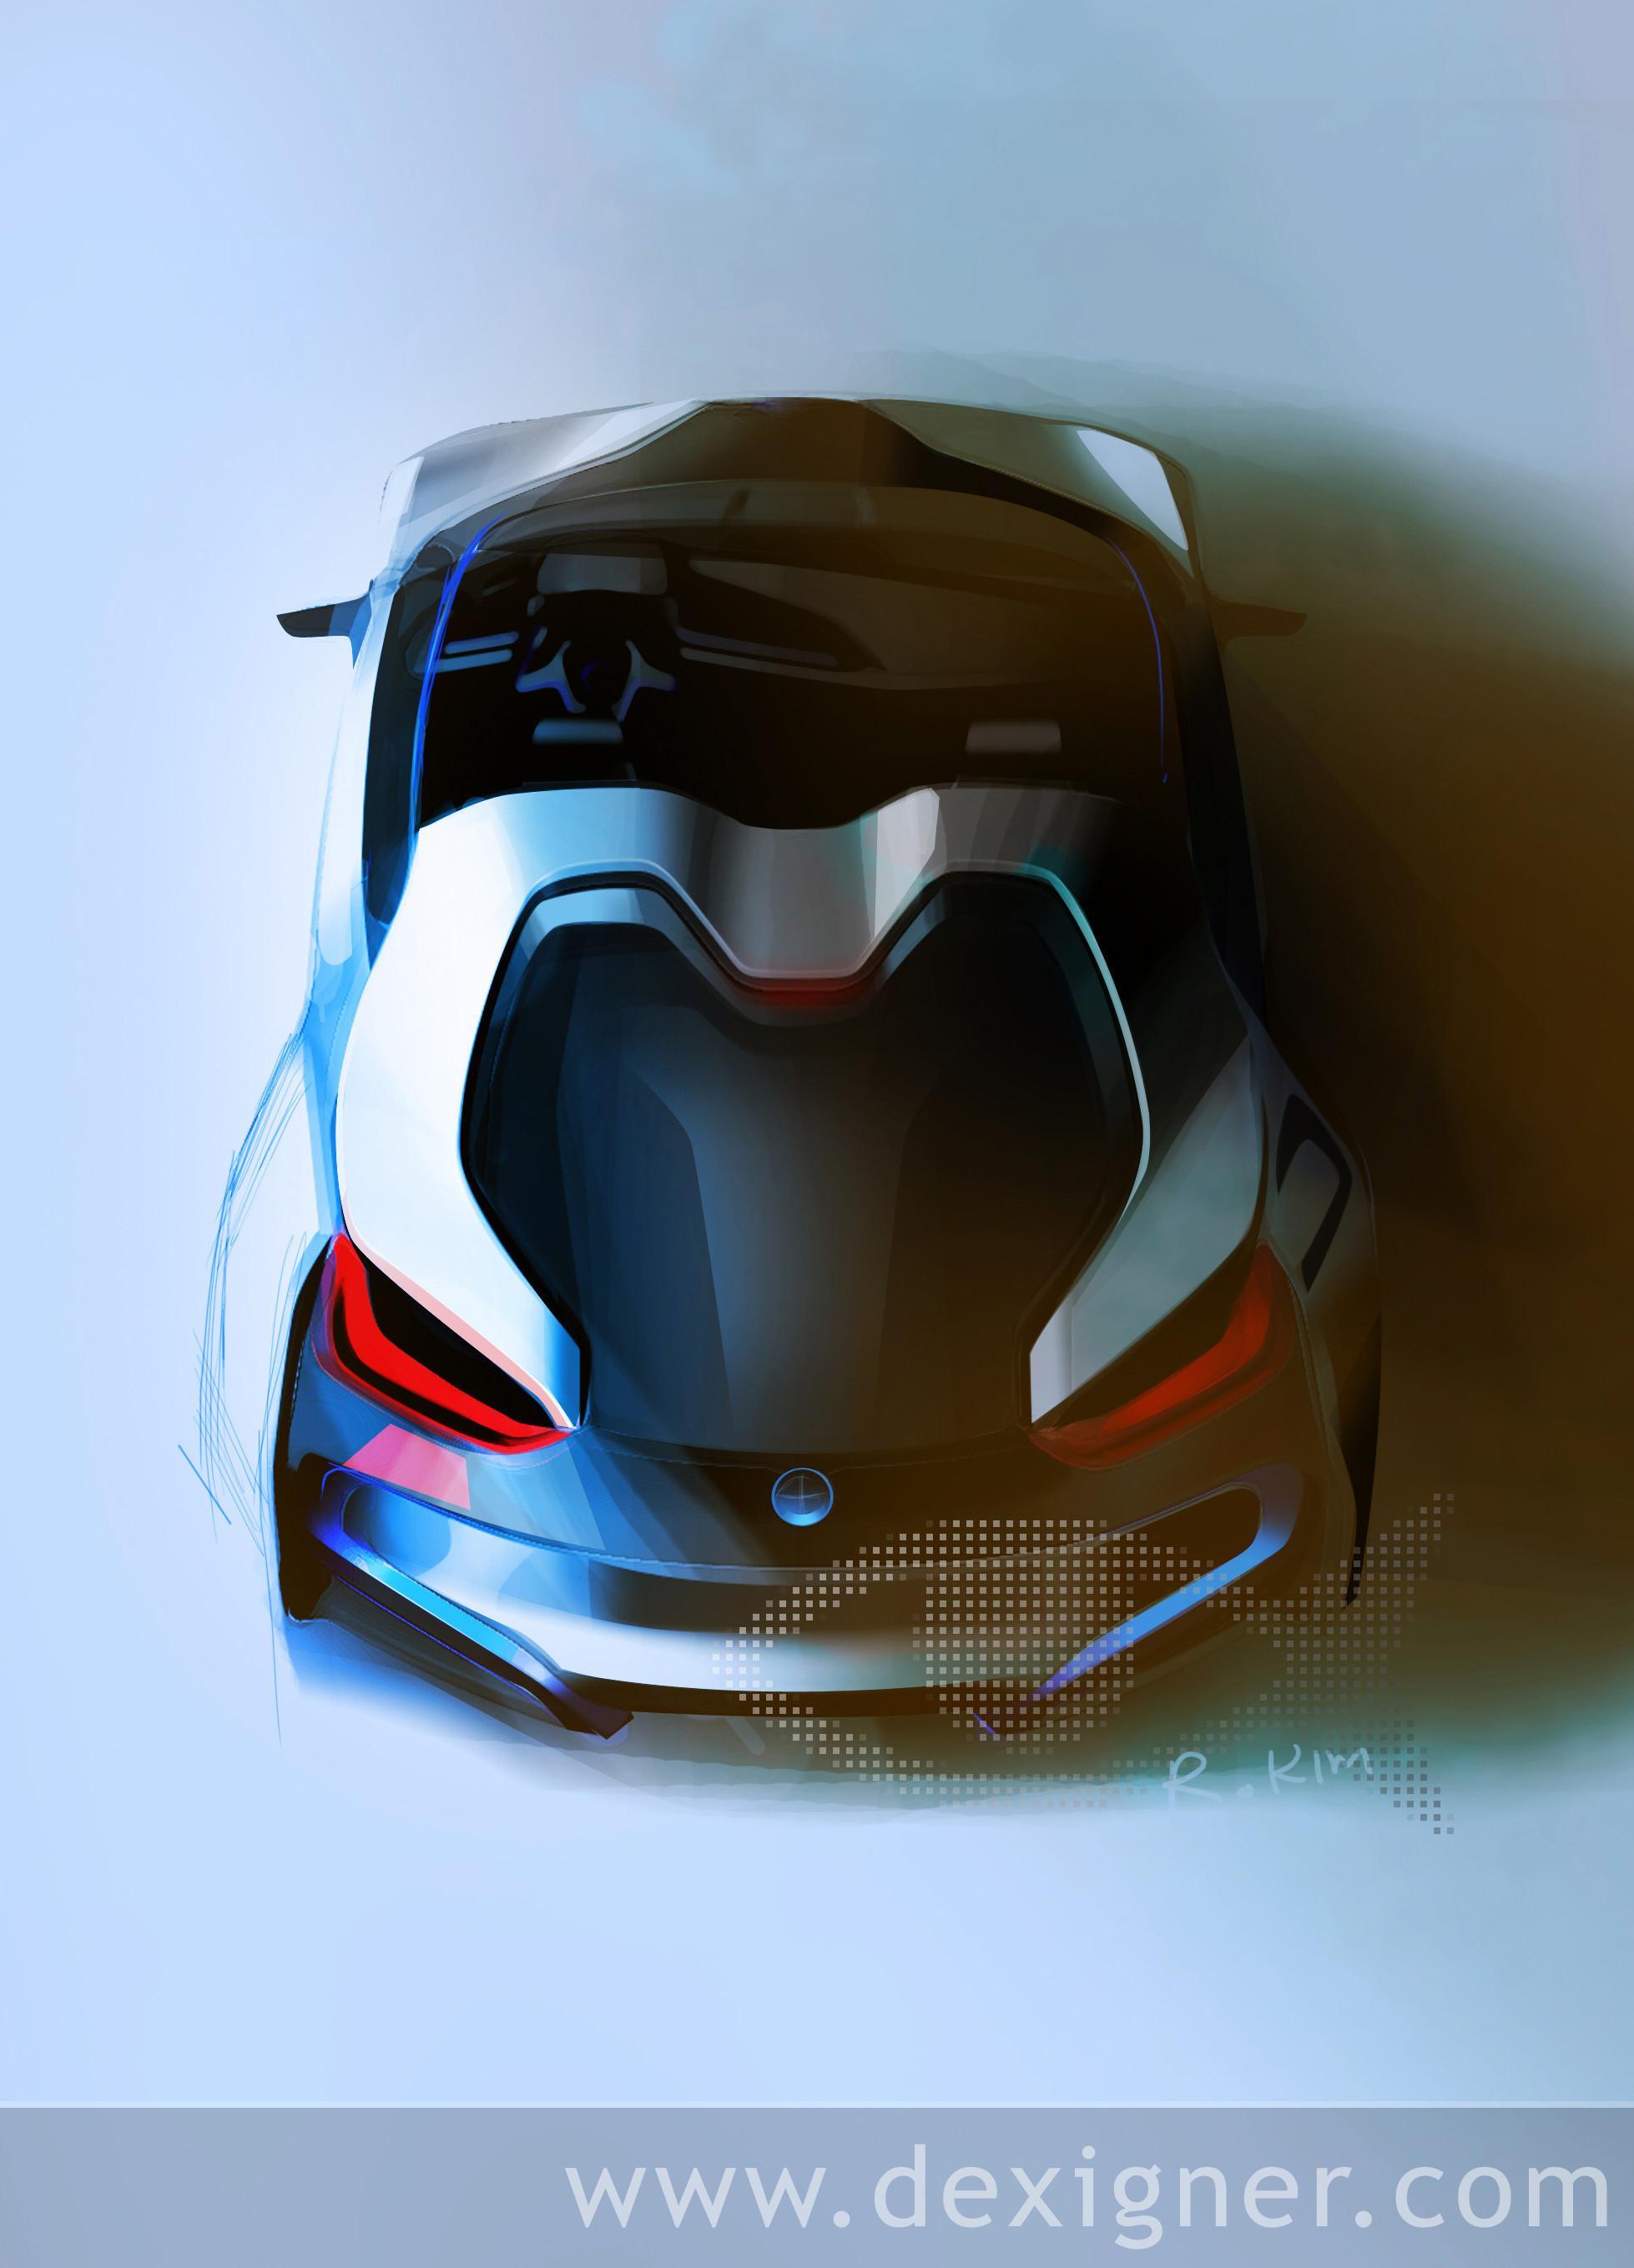 BMW_i8_Concept_Spyder_27.jpg (1958×2718)